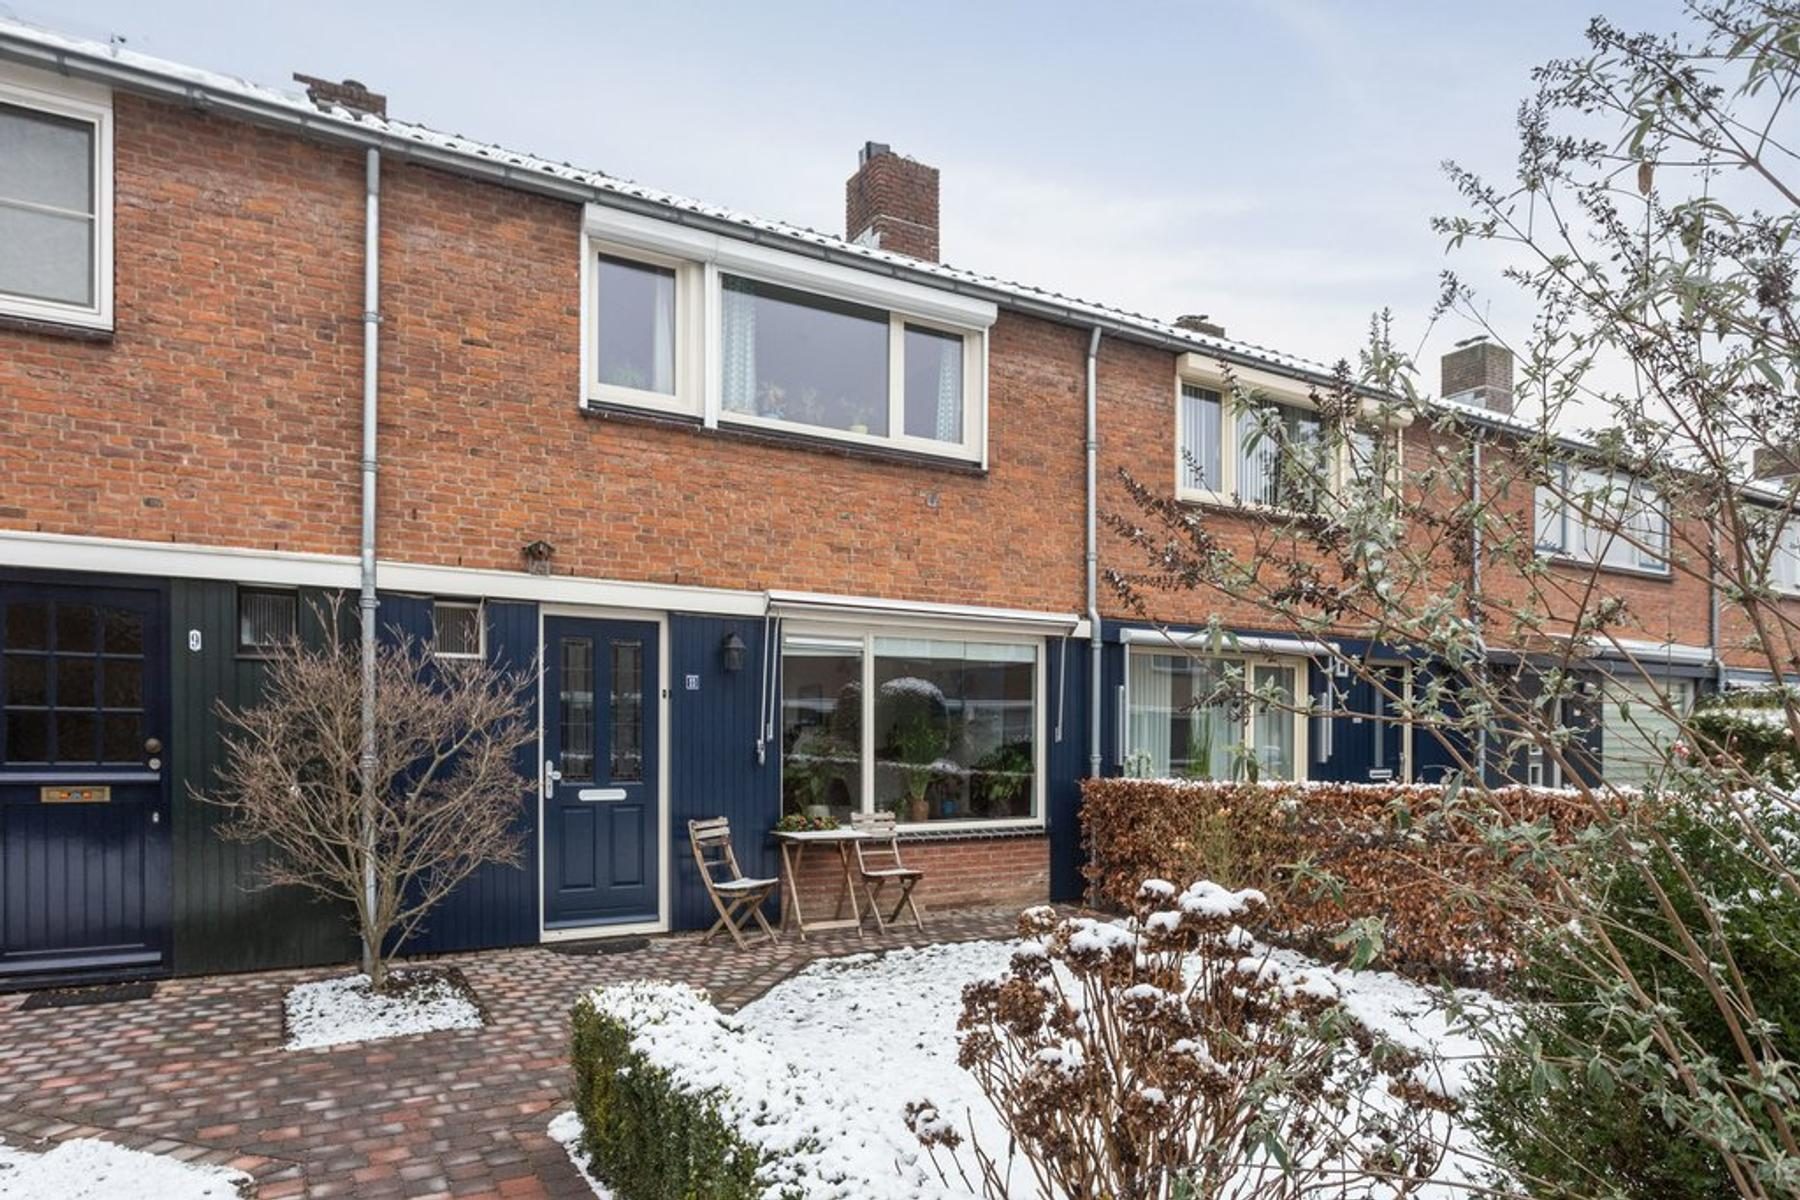 Toutenburgstraat 11 in Arnhem 6825 BL